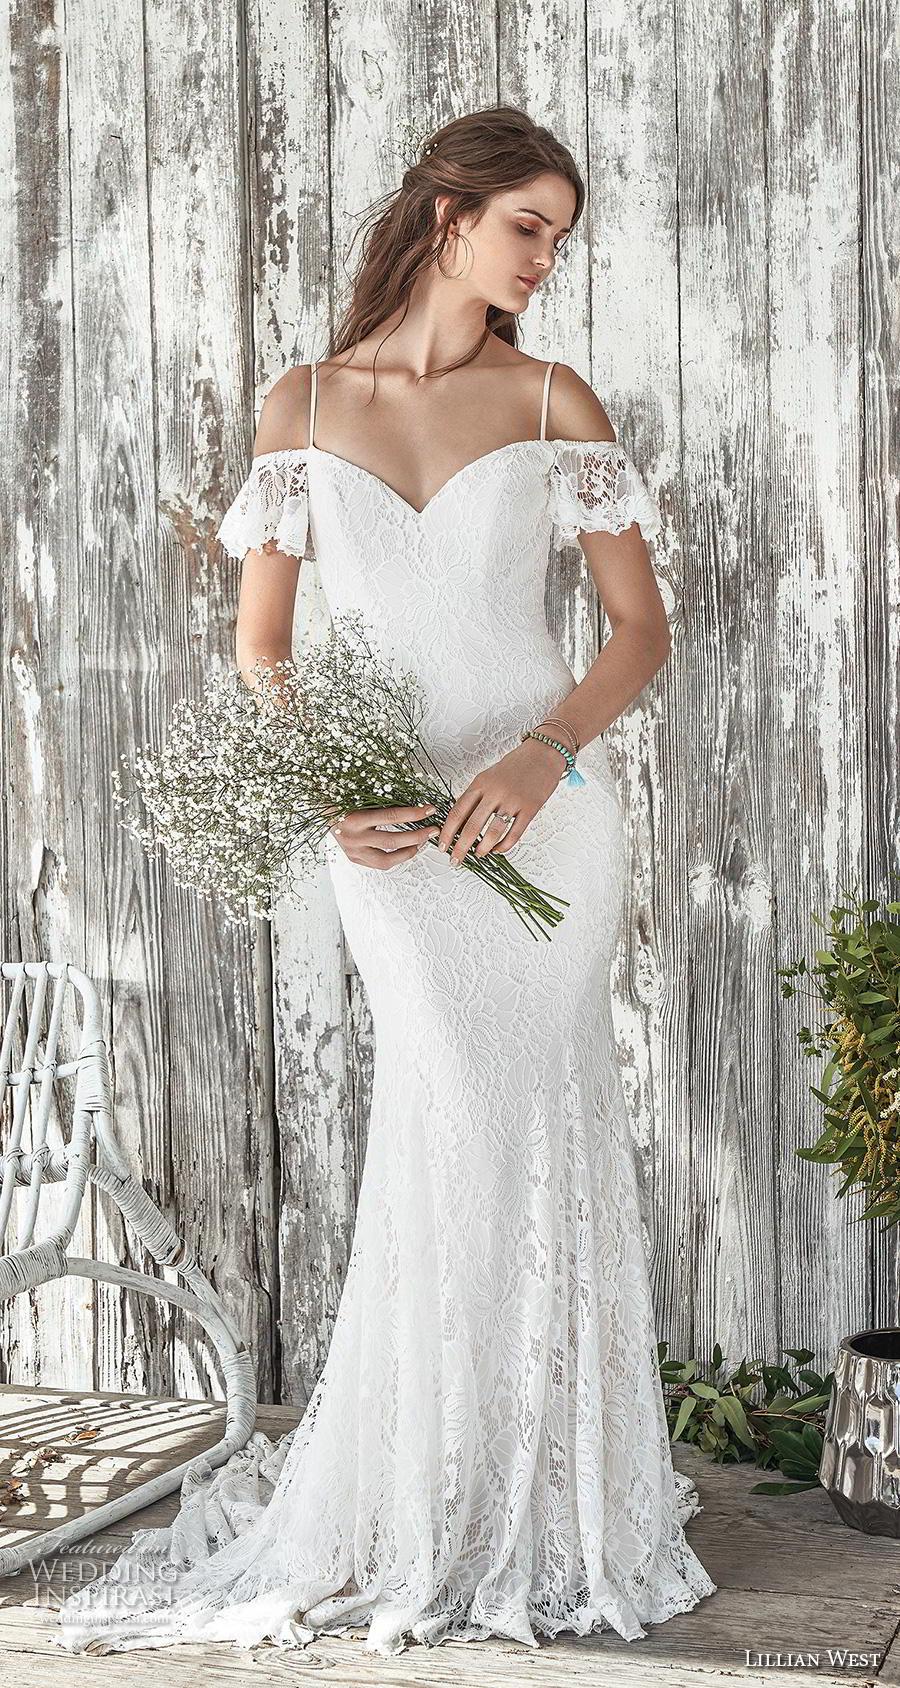 lillian west spring 2019 bridal short sleeves thin strap cold shoulder sweetheart neckline full embellishment elegant fit and flare wedding dress cross strap medium train (14) mv